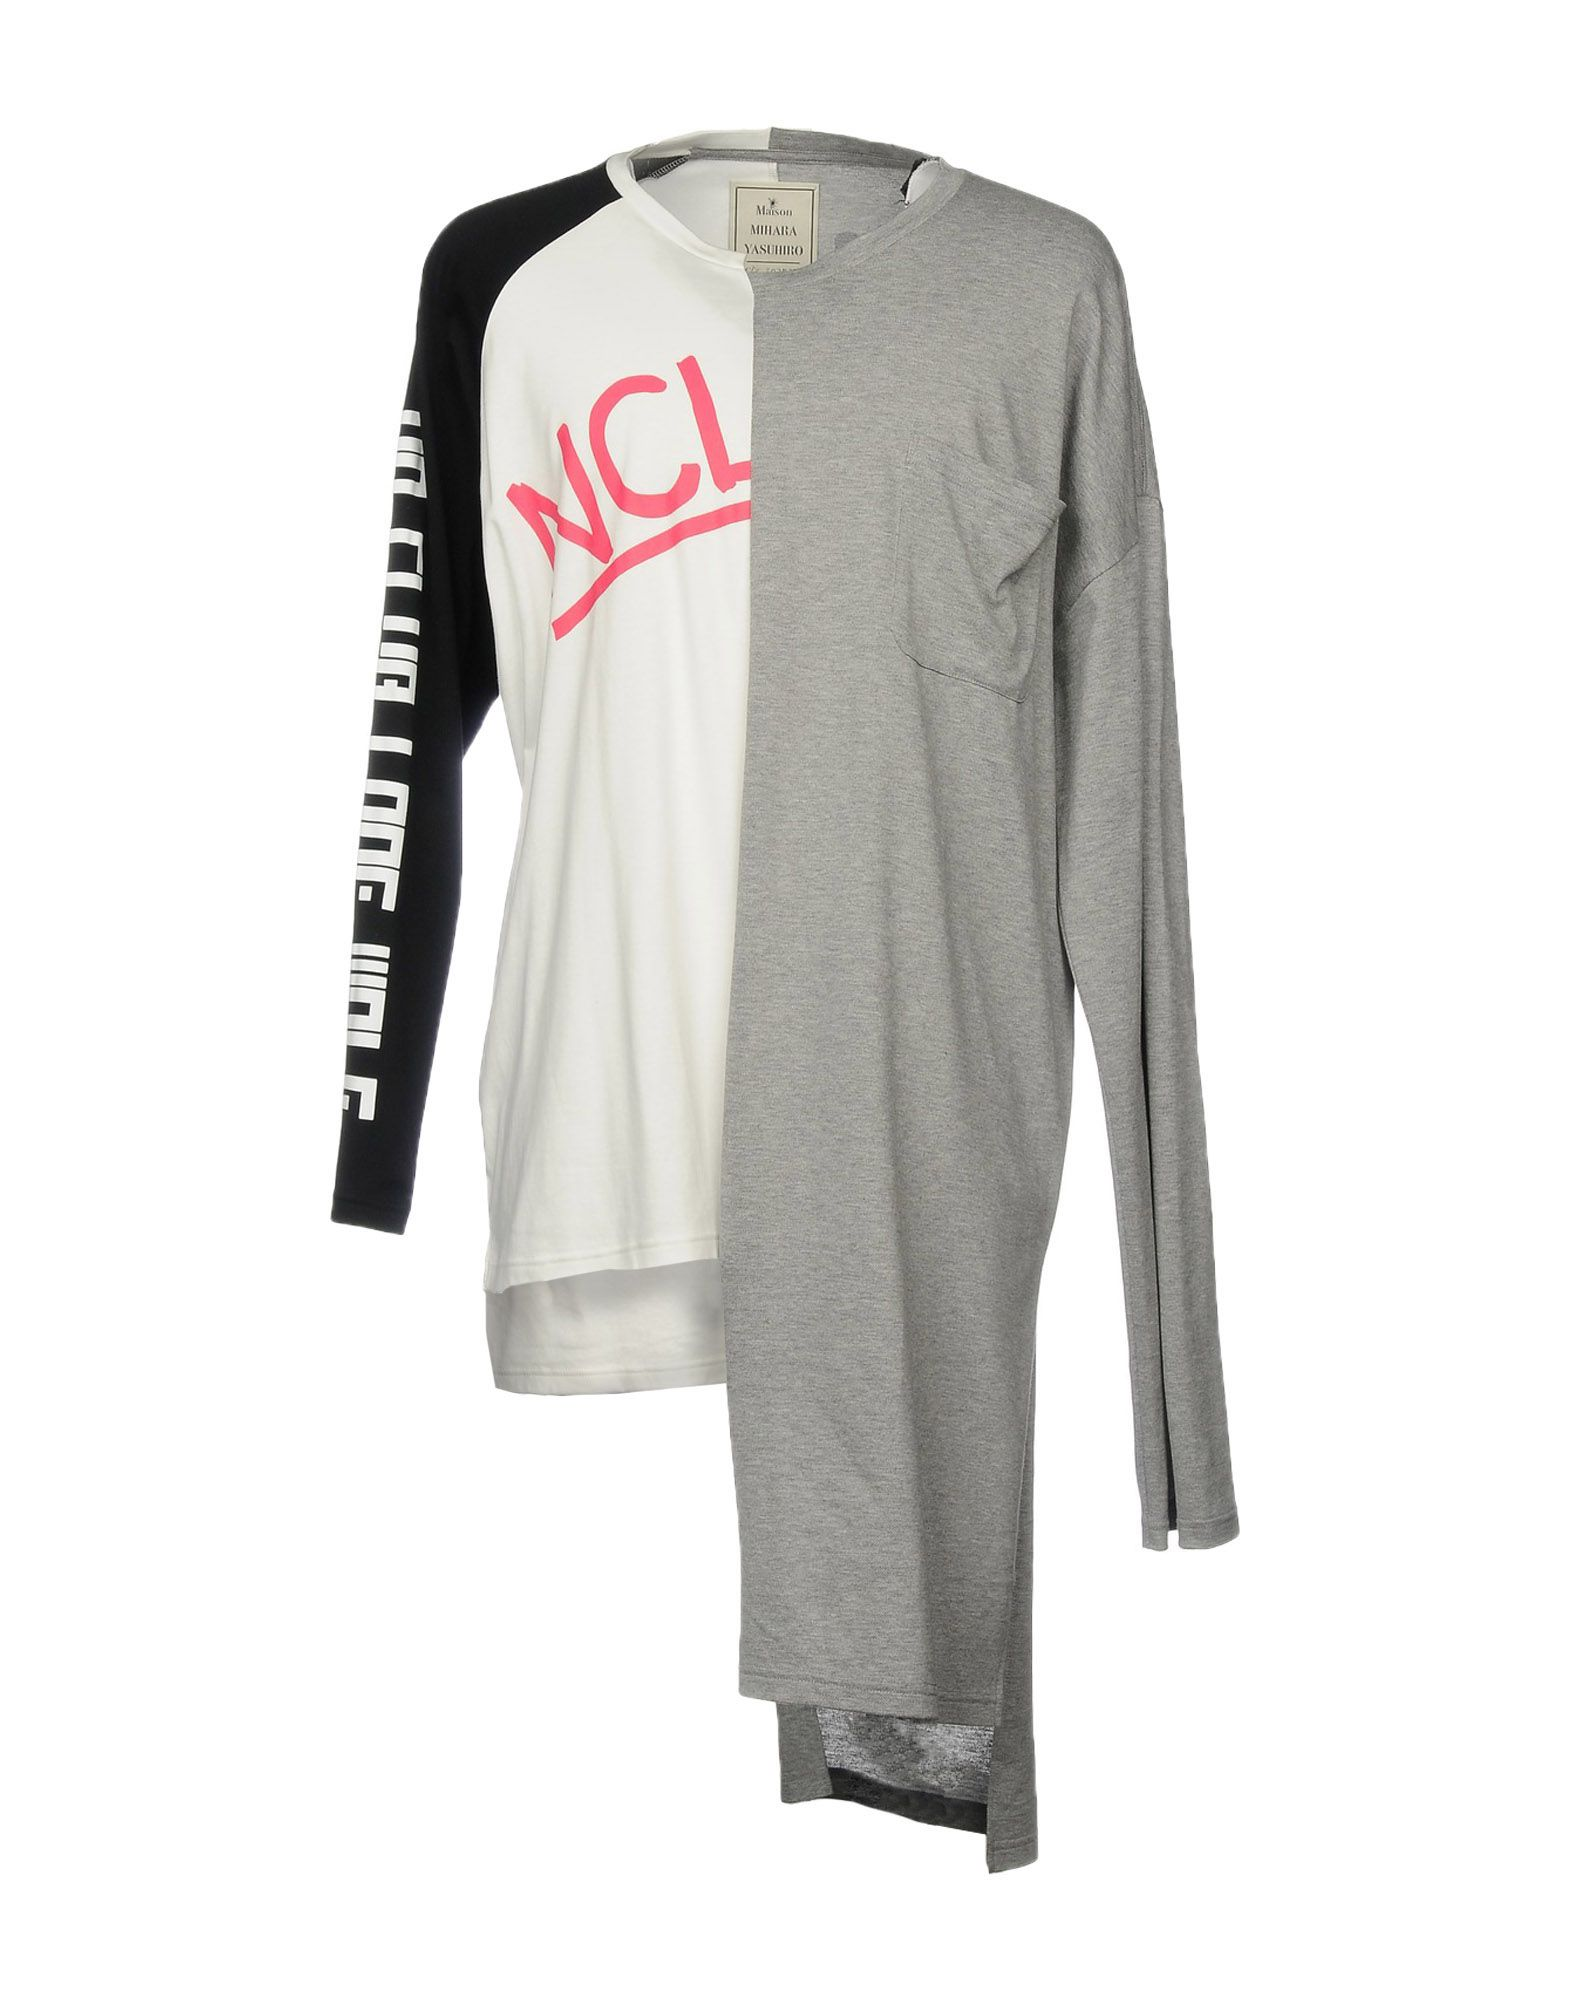 A - buon mercato A buon mercato T-Shirt Miharayasuhiro Uomo - A 12141384TH 8ee9af